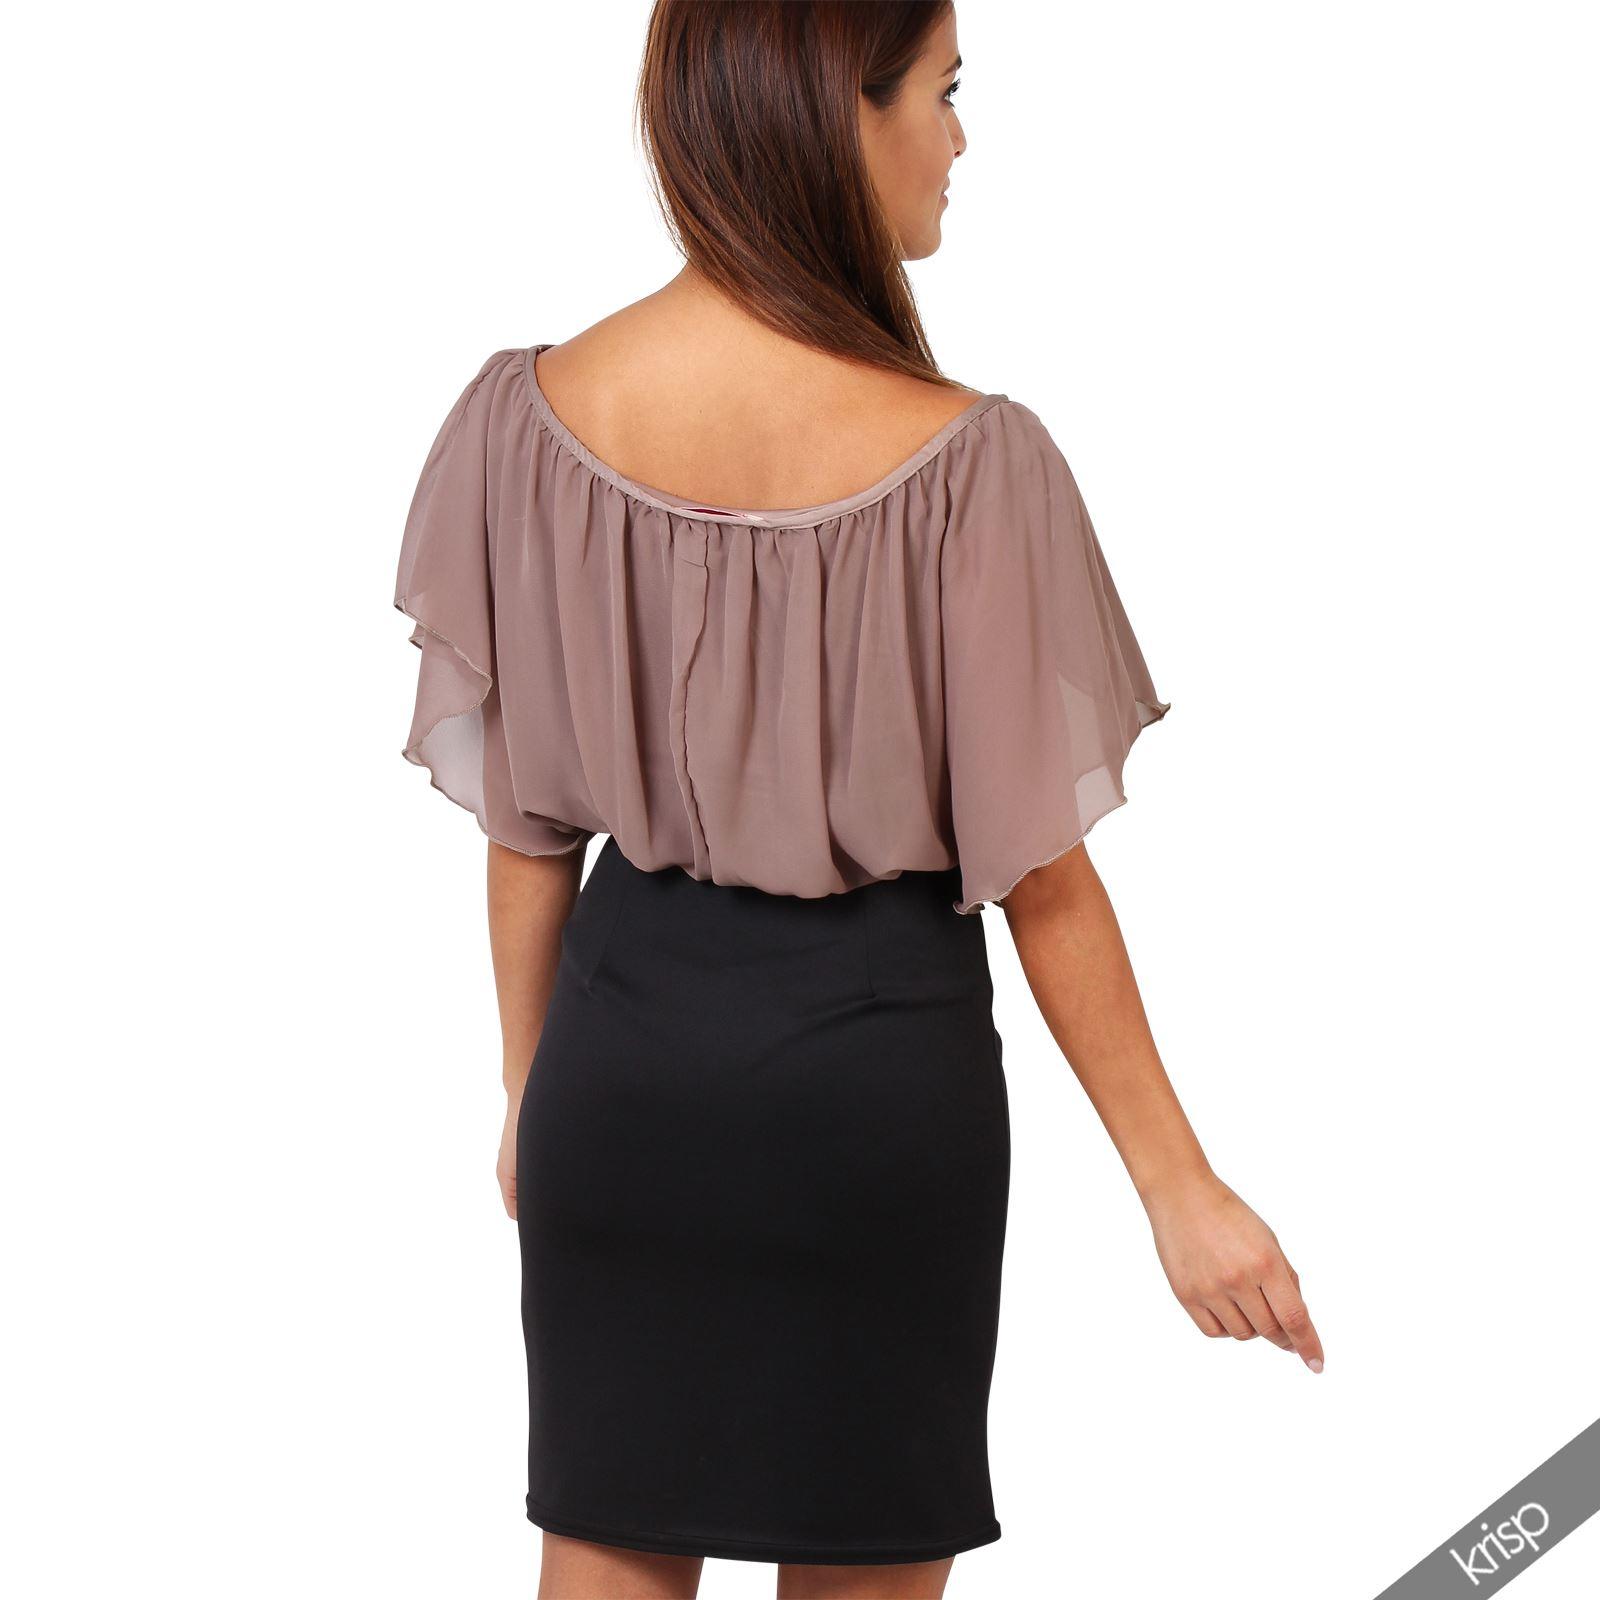 Womens-Pleated-Chiffon-Batwing-Top-High-Waist-Pencil-Bodycon-Skirt-Mini-Dress thumbnail 18